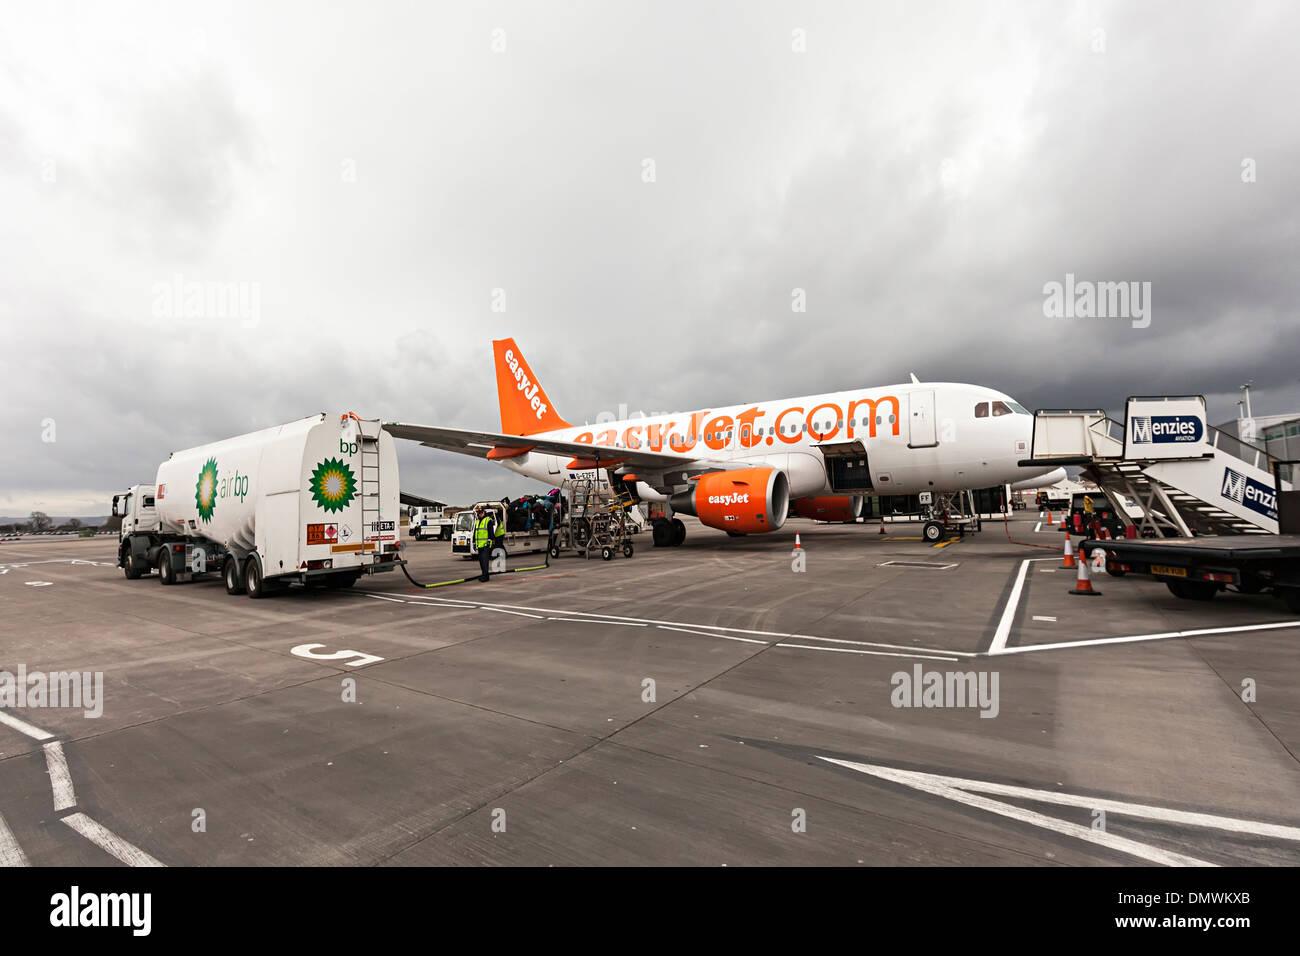 Easyjet aeroplane being refuelled on tarmac, Bristol airport, England, UK - Stock Image